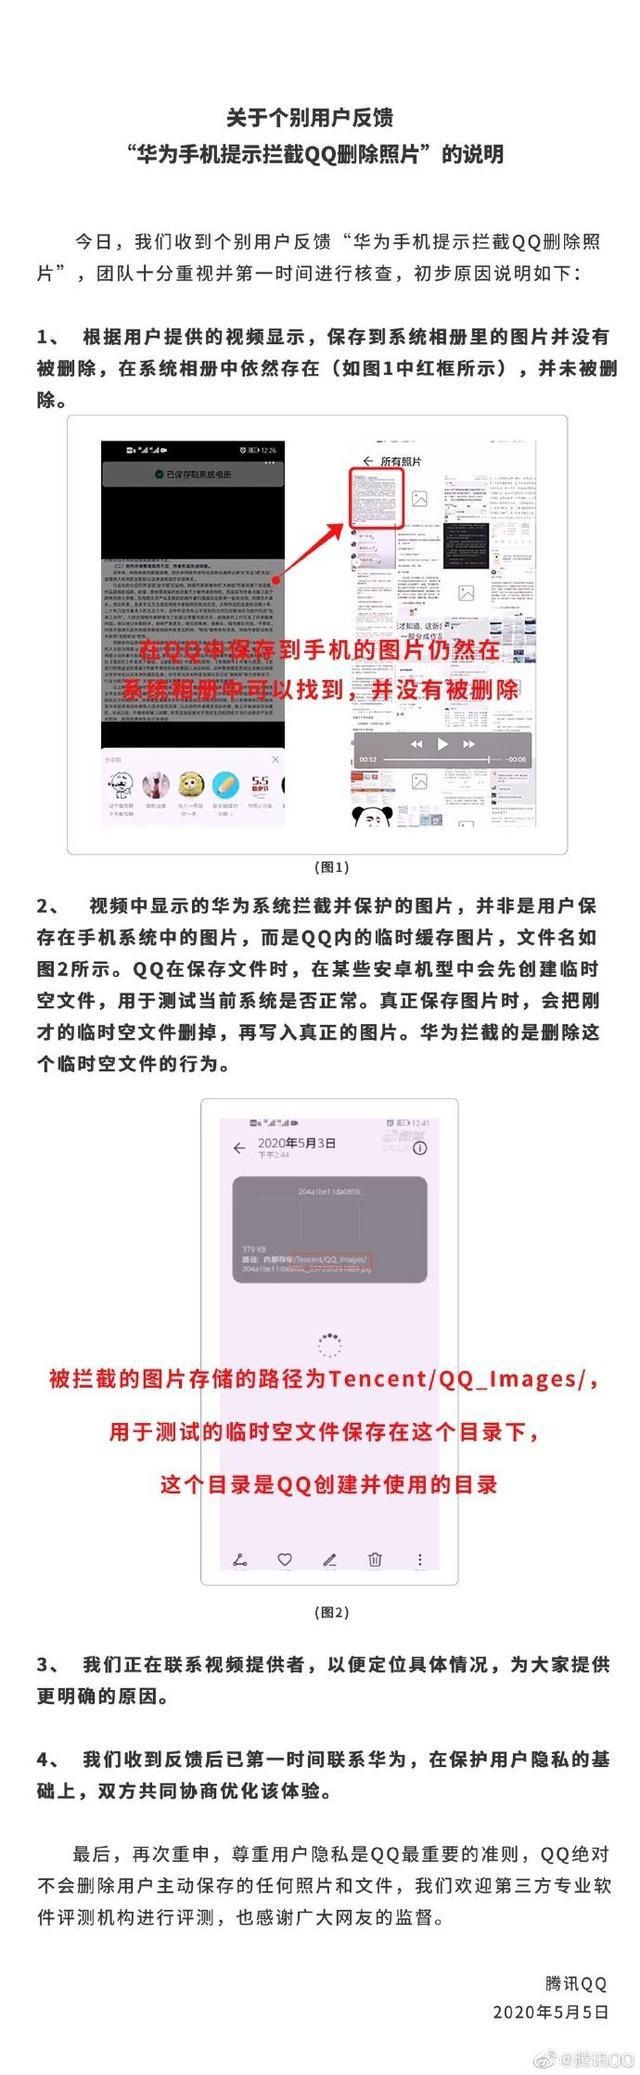 QQ回应偷删照片的具体原因.png